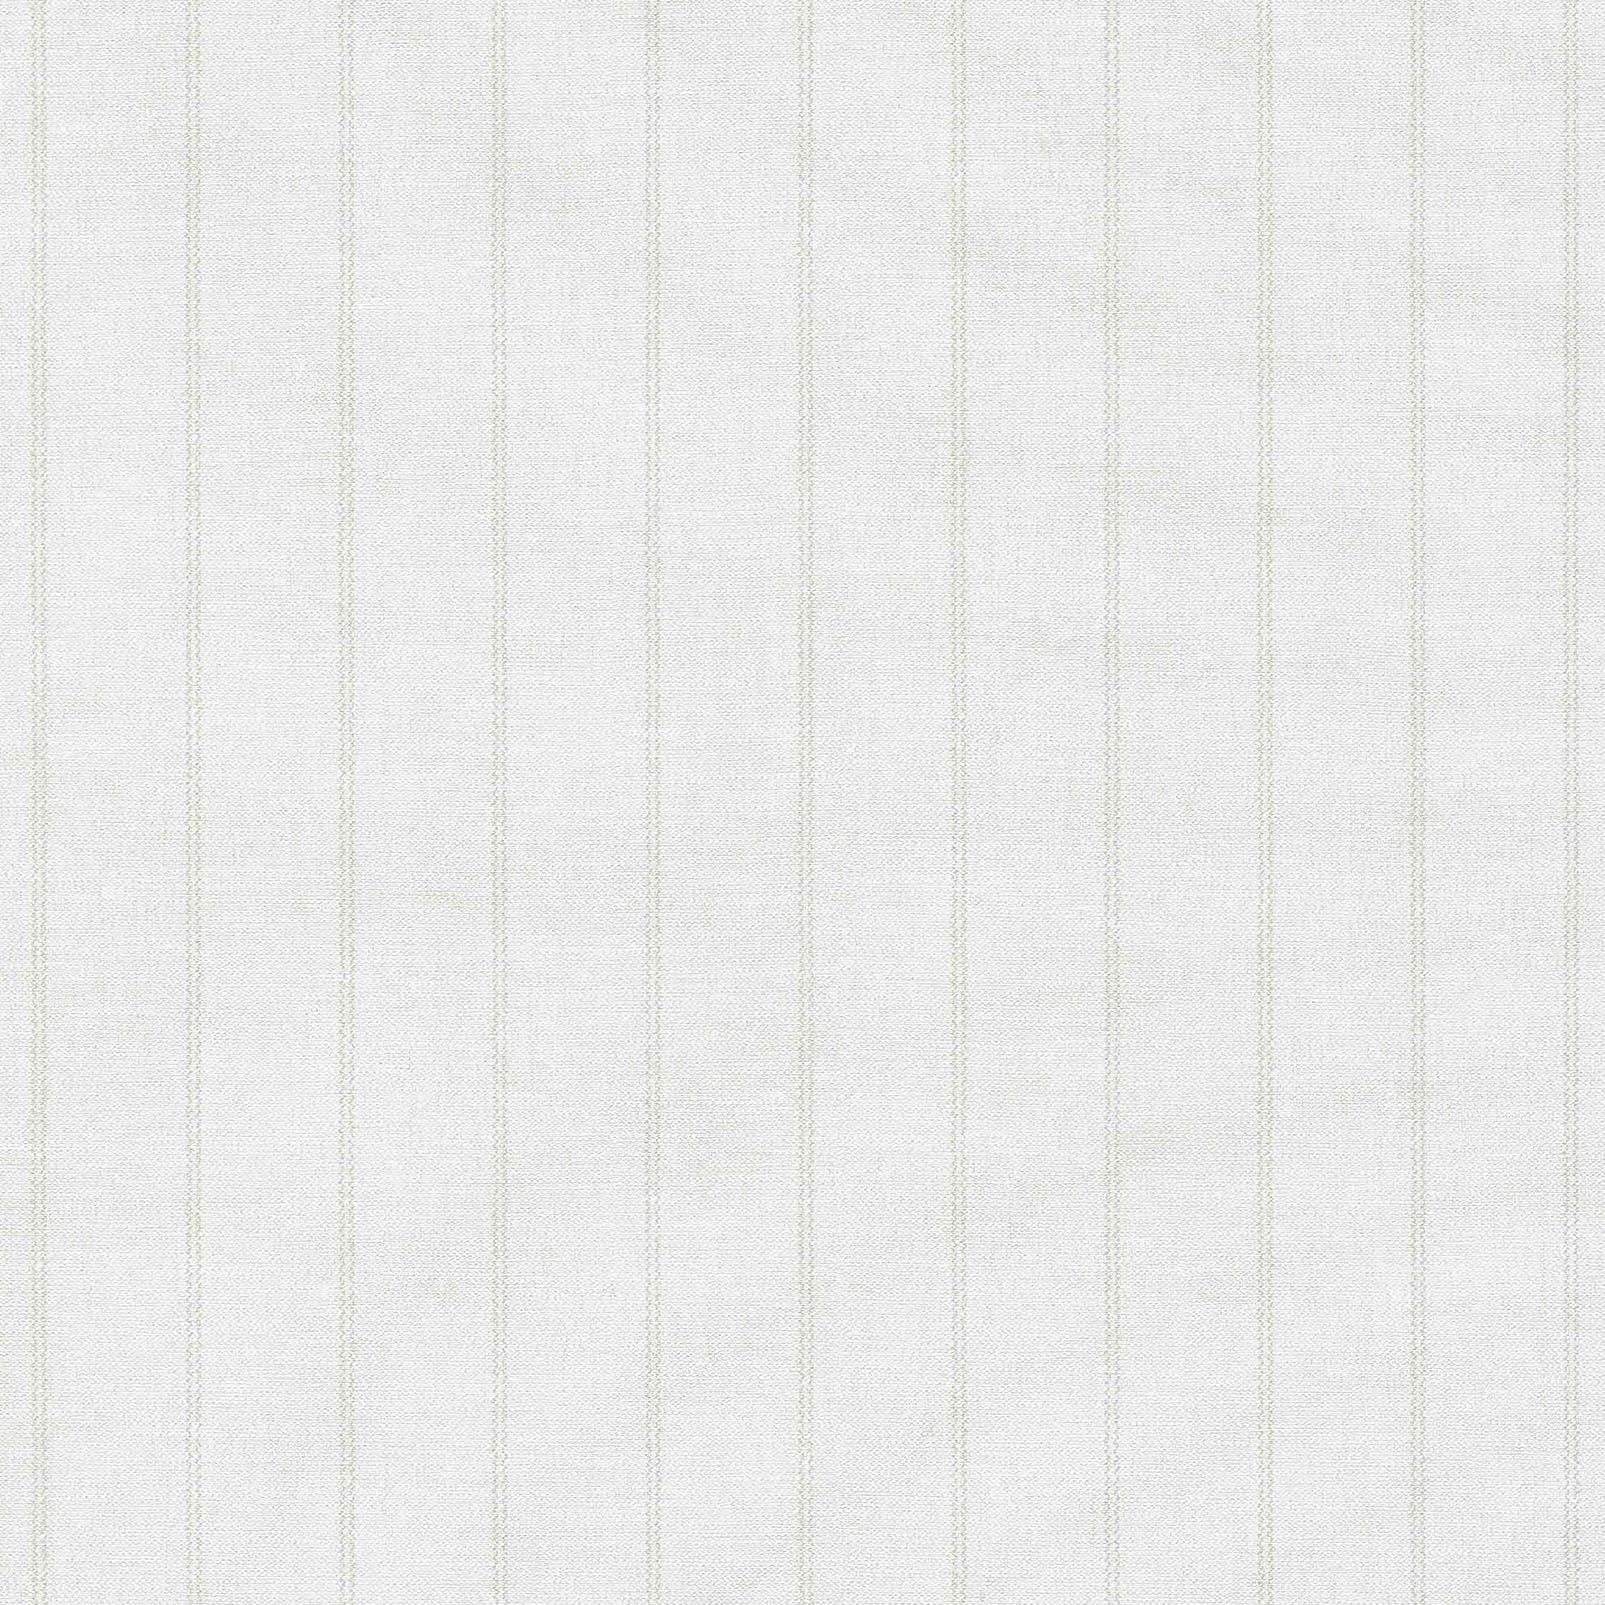 RM2 LILLE STRIPES RM2 219900 WHITE